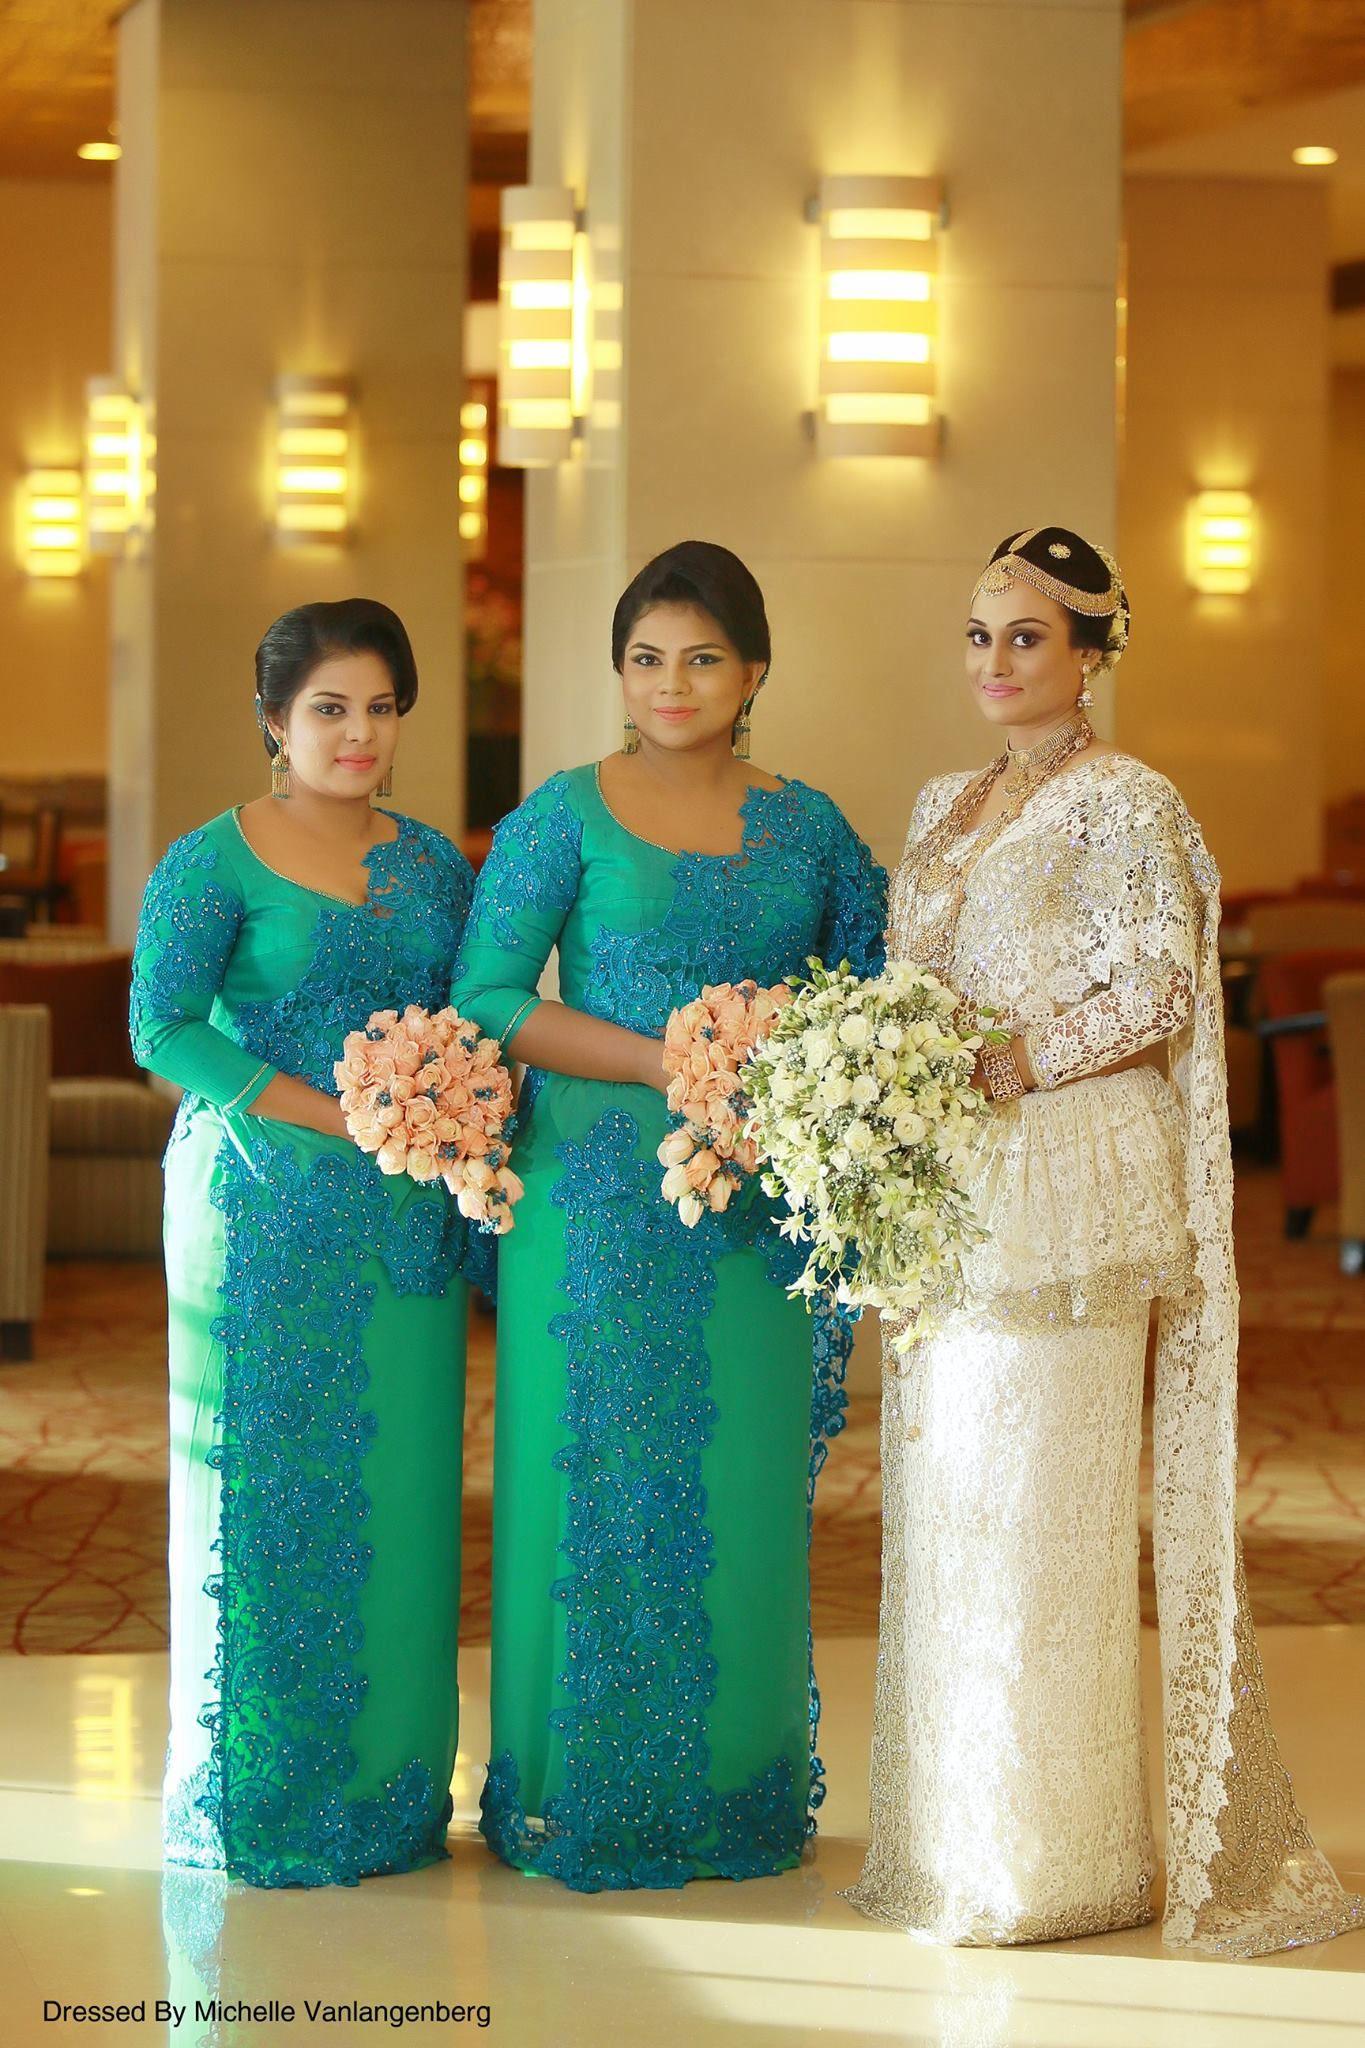 By michelle vanlangenberg sri lankan weddings pinterest by michelle vanlangenberg bridesmaid dressesbridesmaidsblousewedding dress ombrellifo Choice Image